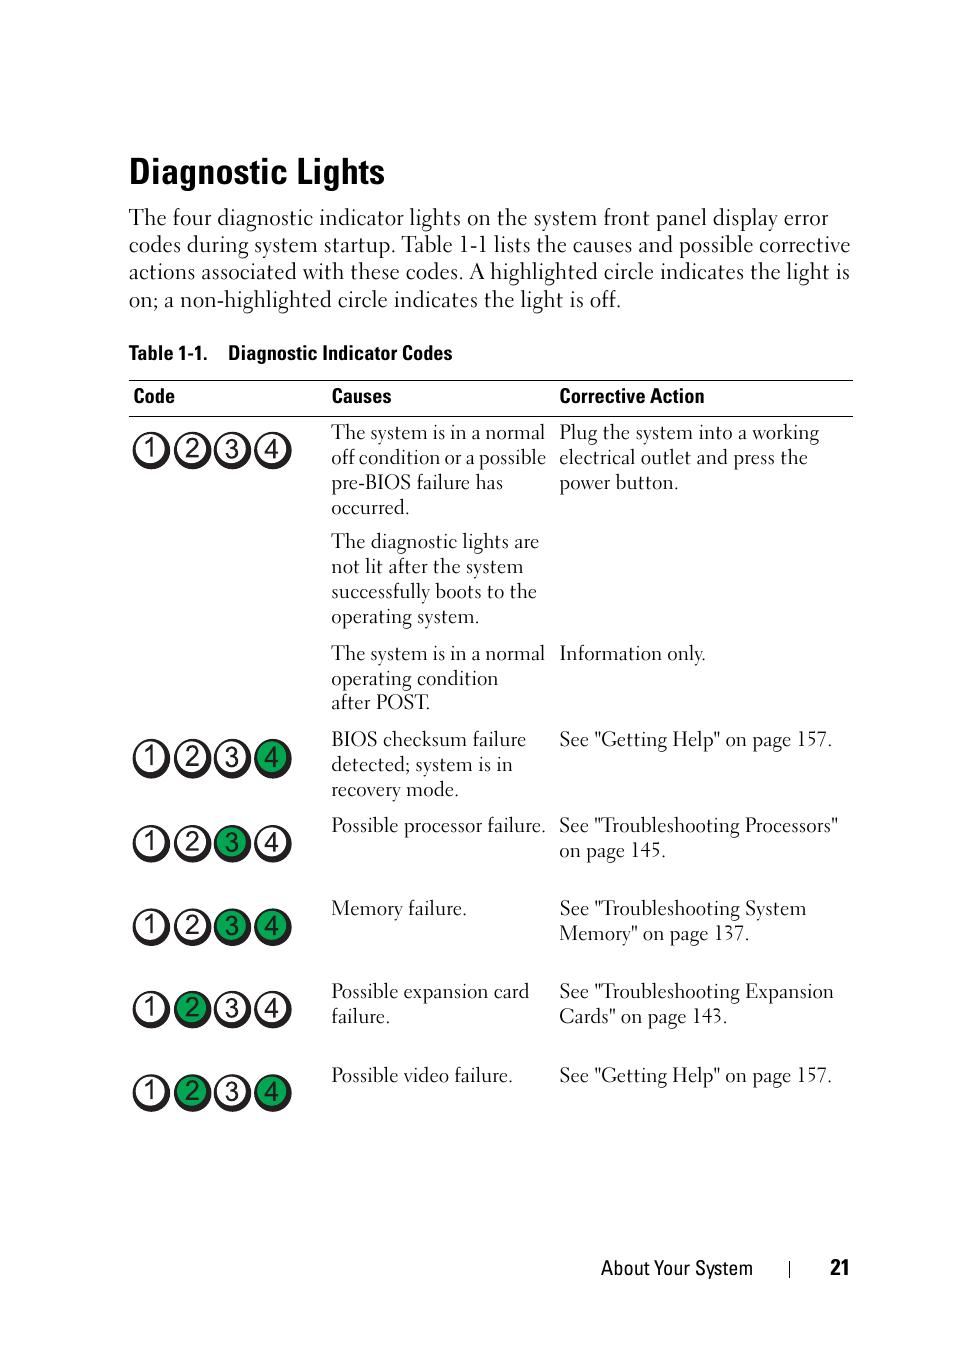 Diagnostic lights | Dell PowerVault NX3100 User Manual